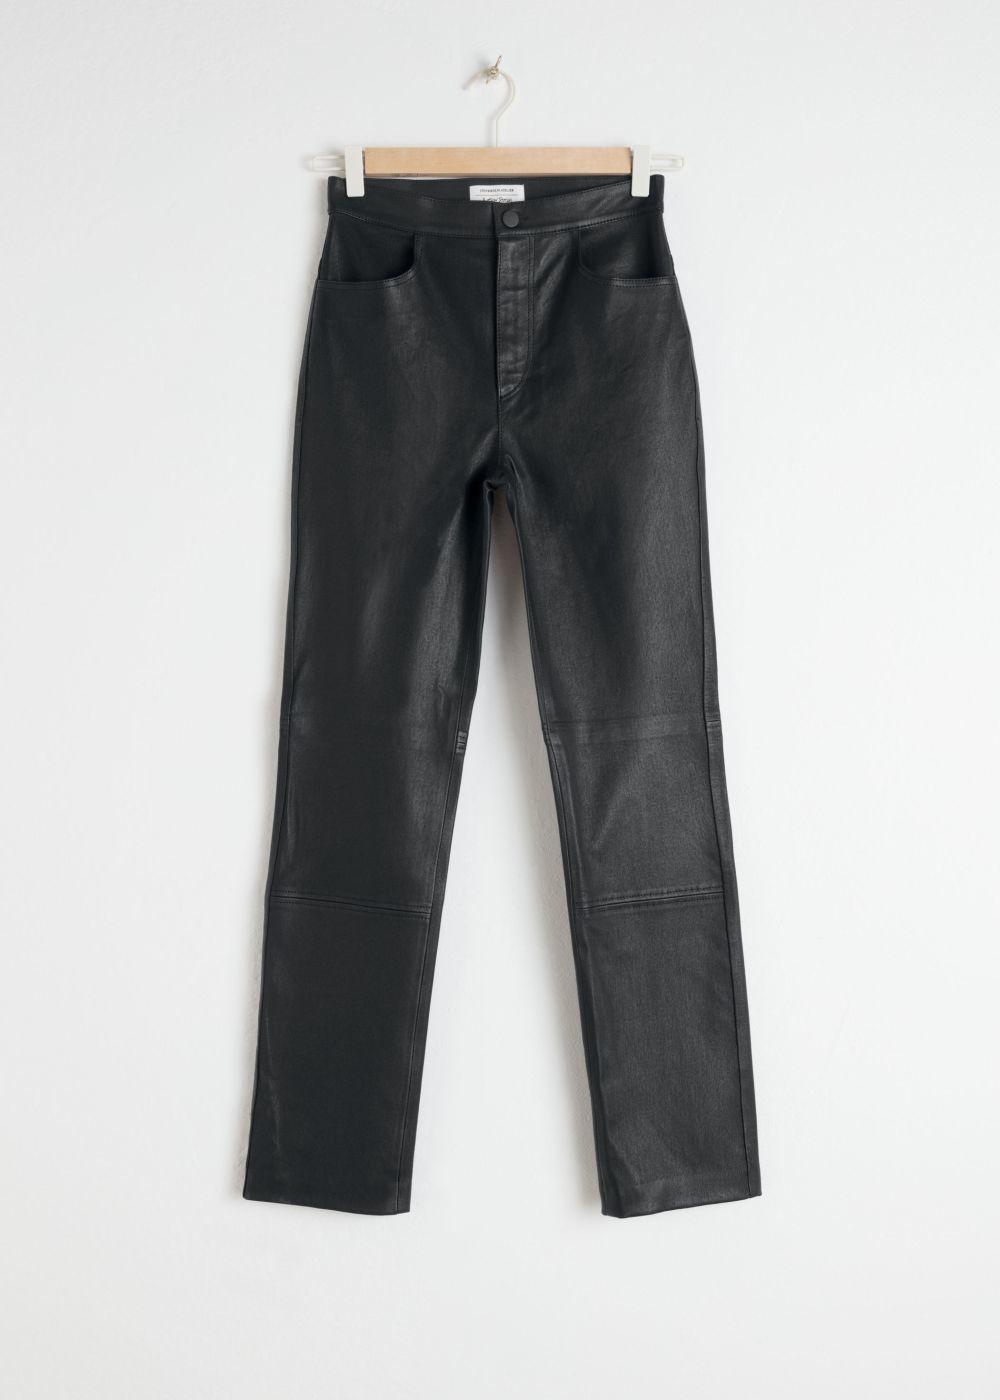 Pantalones de cuero de &Other Stores (295 euros).